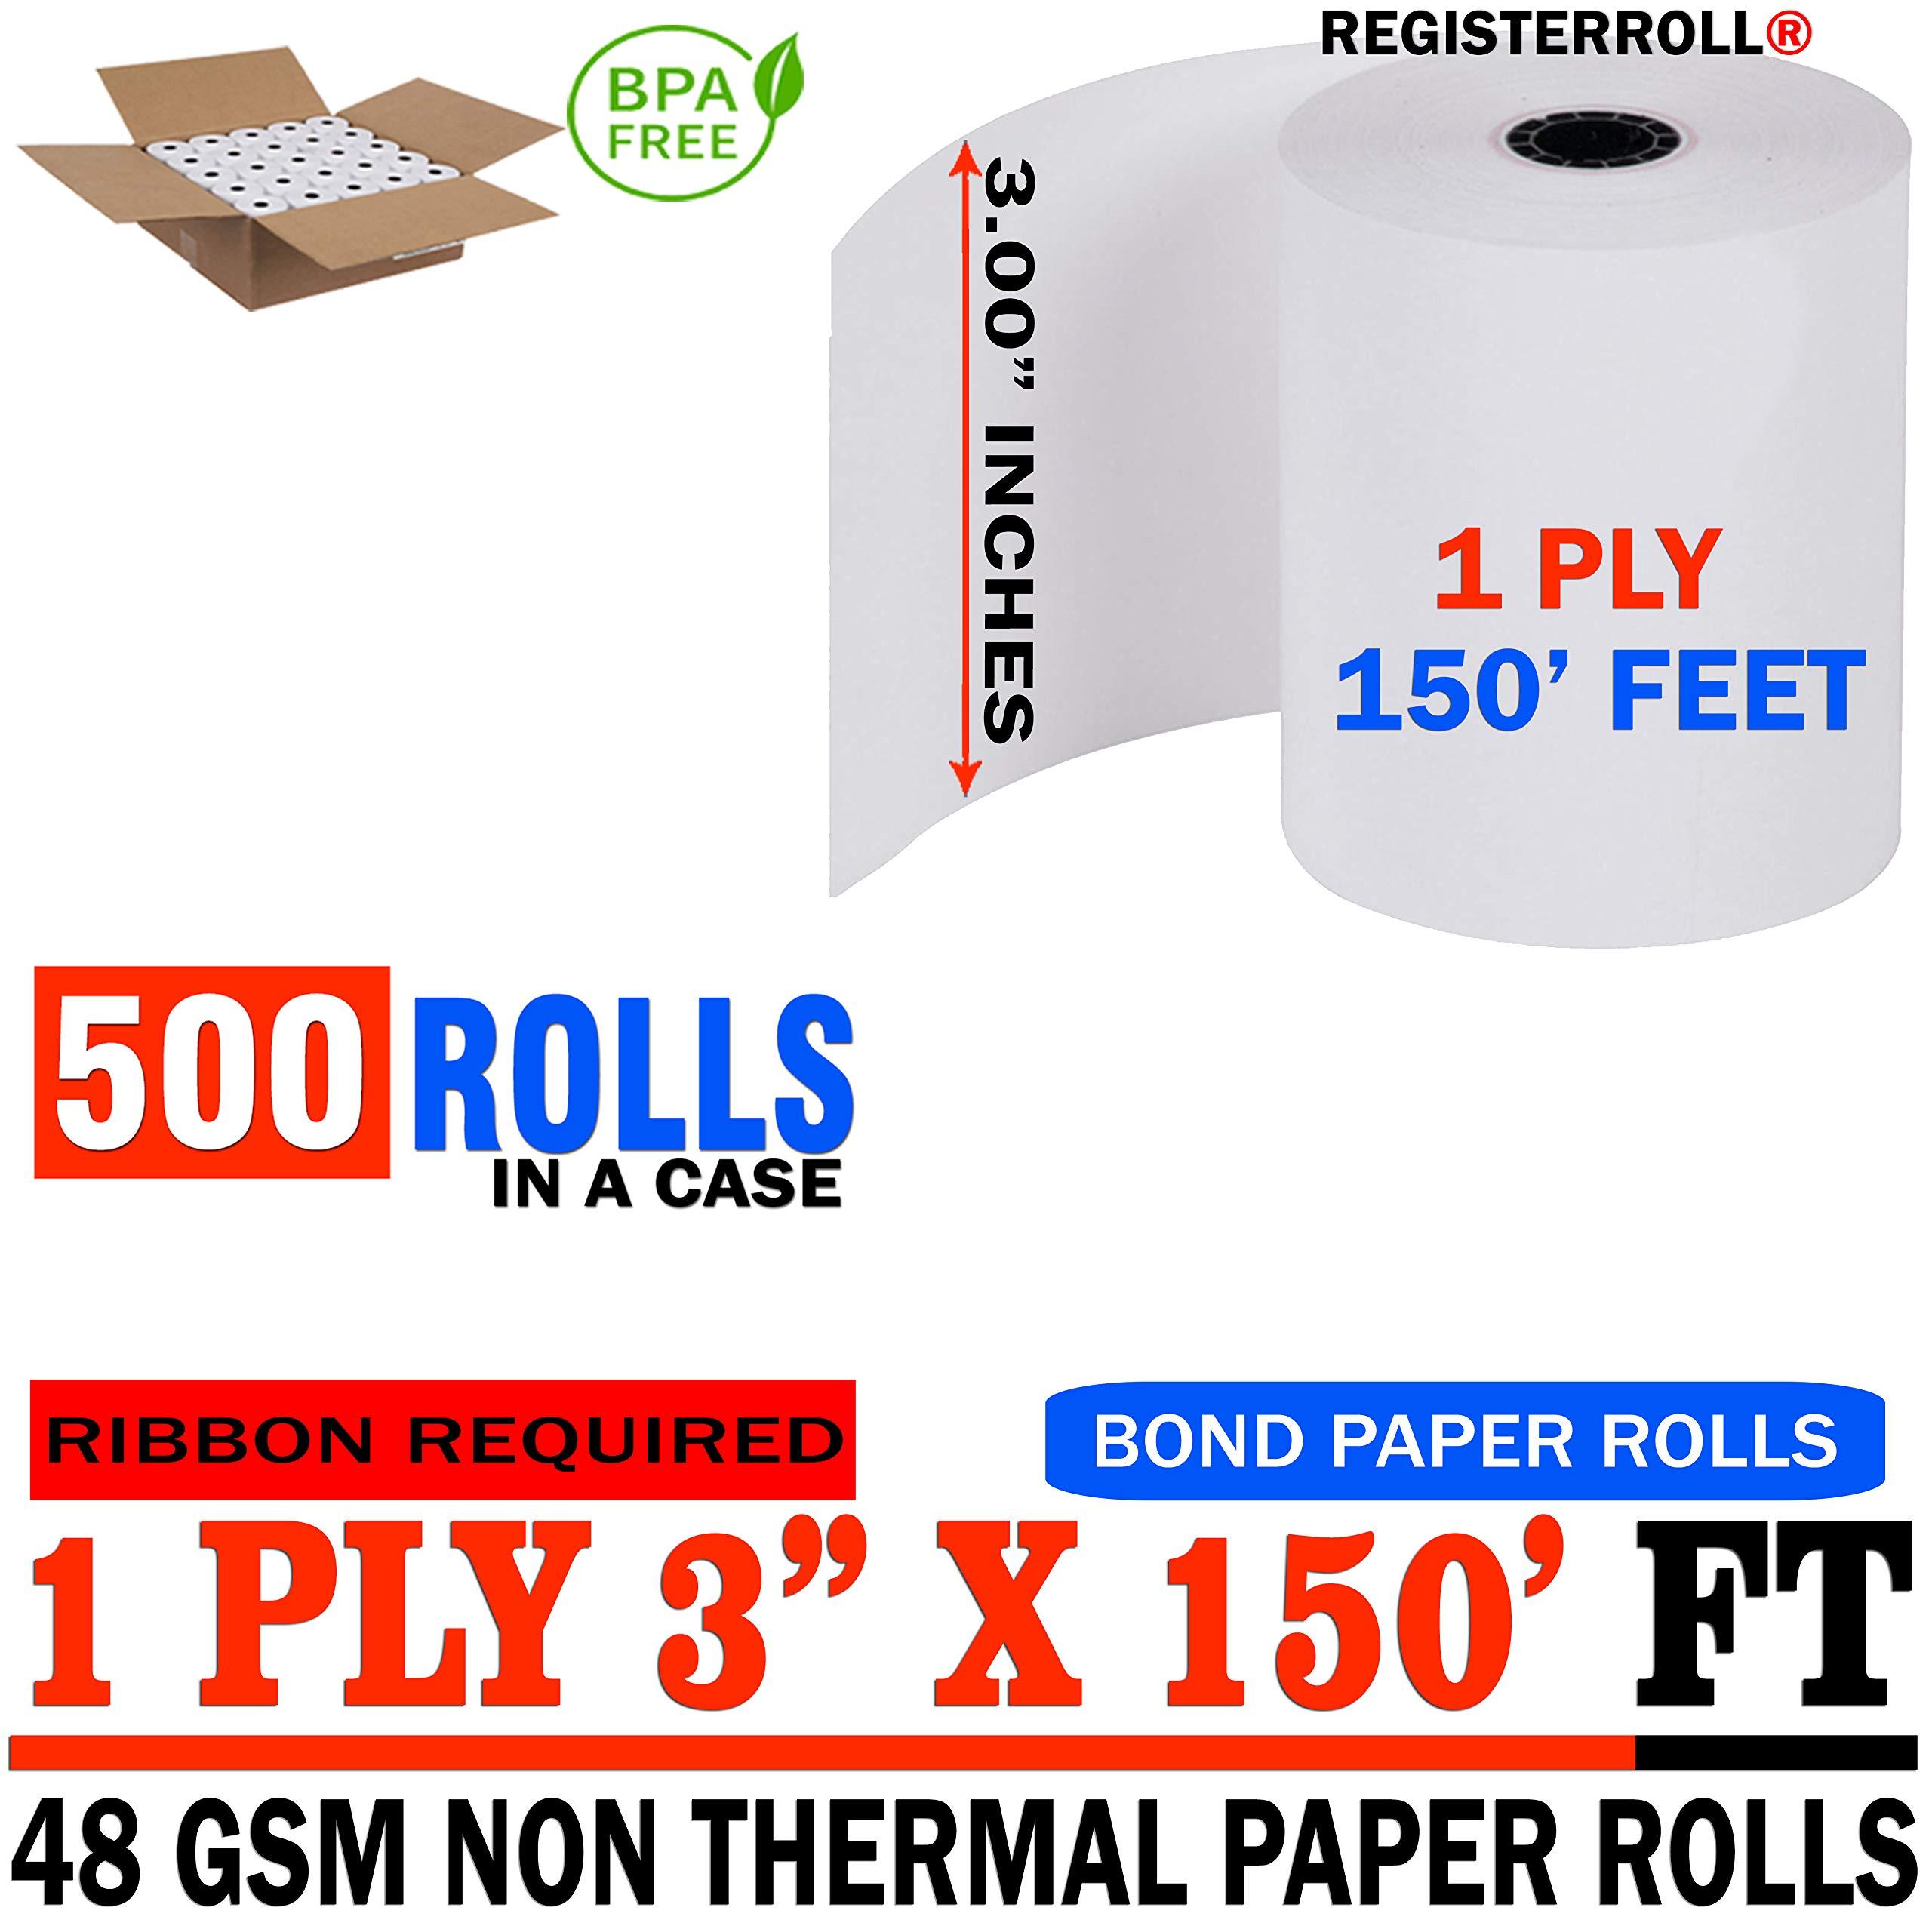 3'' x 150' 1-Ply Bond (500 Rolls), Works for Epson TM-U200B, Epson TM-U200D, Epson TM-U210, Epson TM-U220 - from RegisterRoll (500 Rolls)